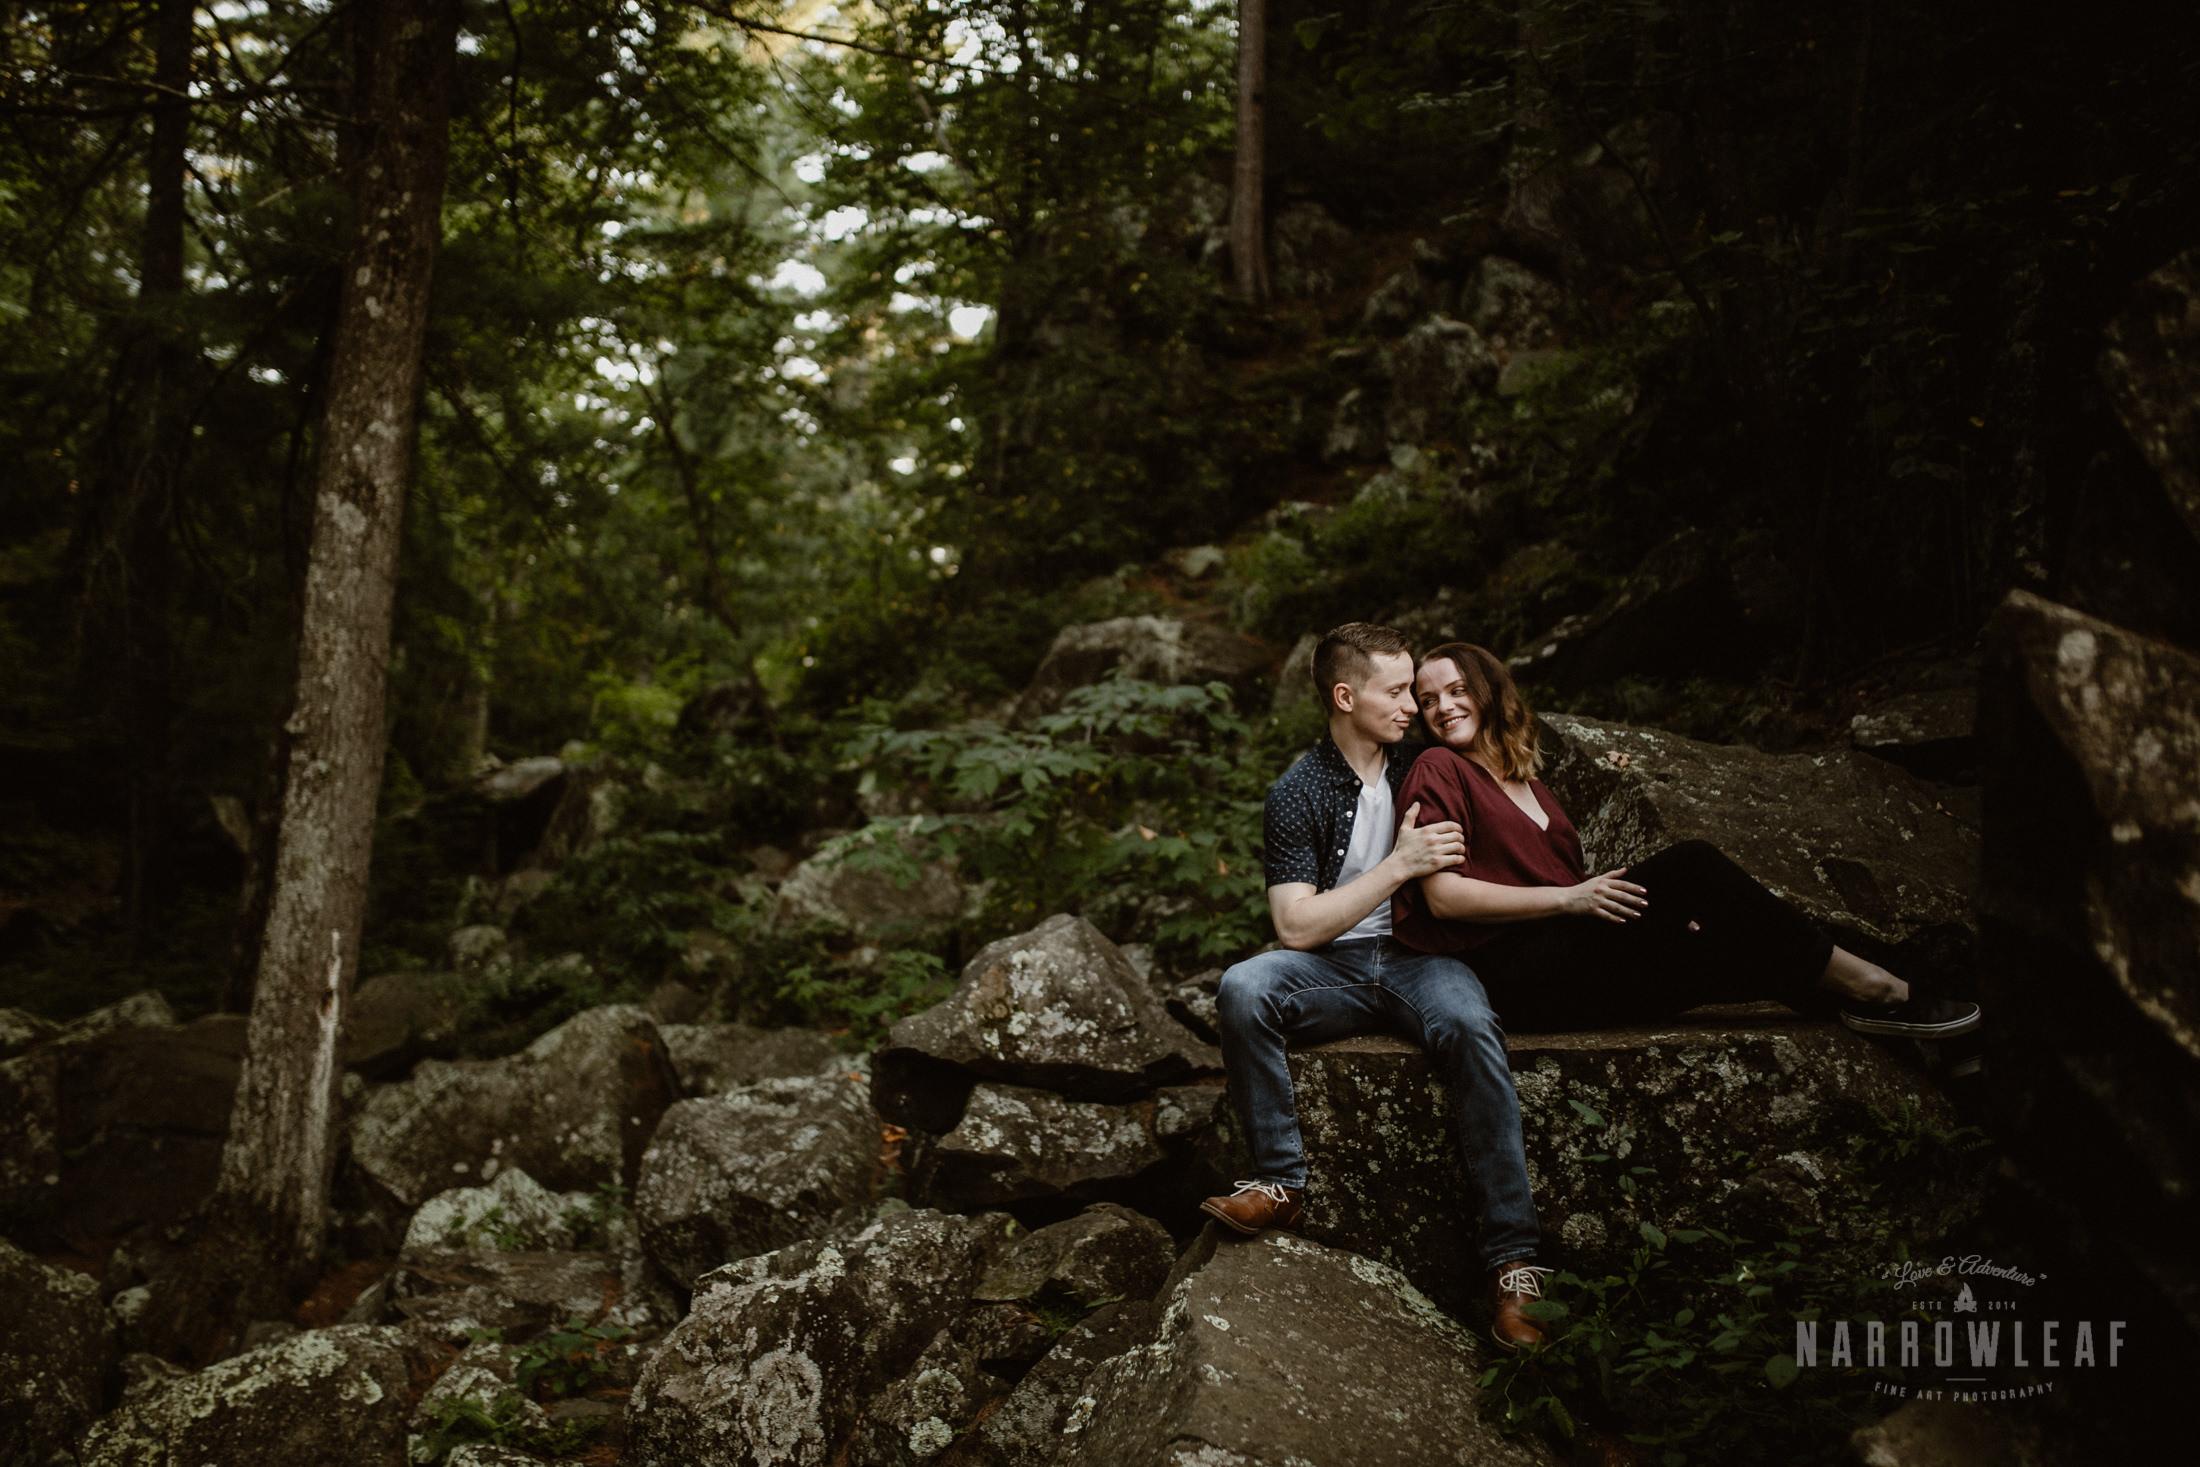 Wisconsin-wedding-adventure-photographer-Narrowleaf_Love_and_Adventure_Photography-0965.jpg